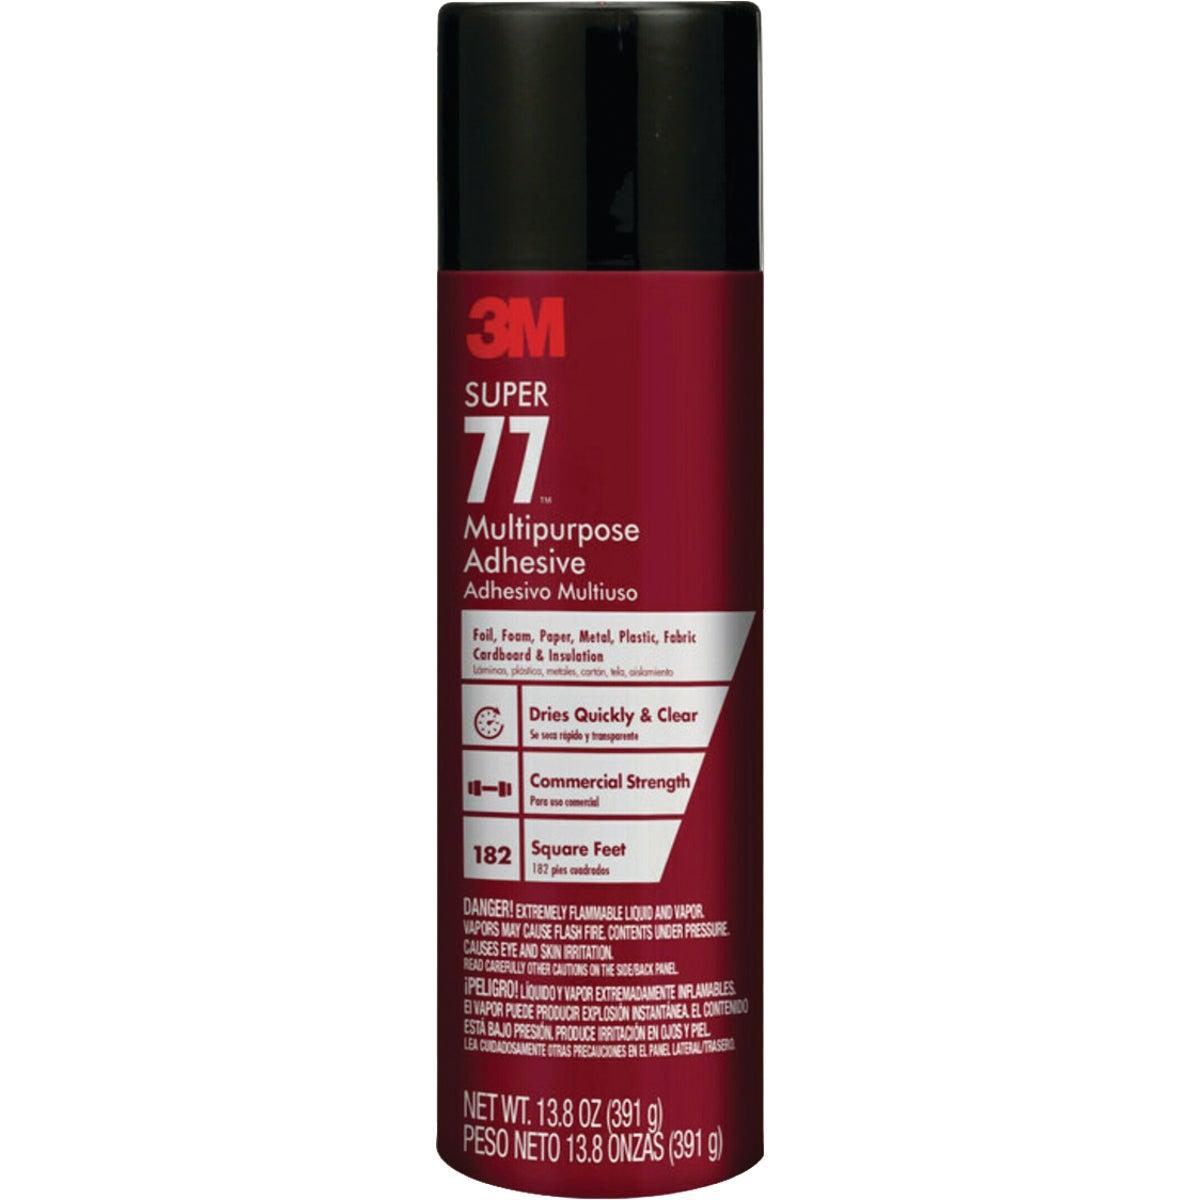 17OZ SPRAY ADHESIVE - 77 by 3m Co